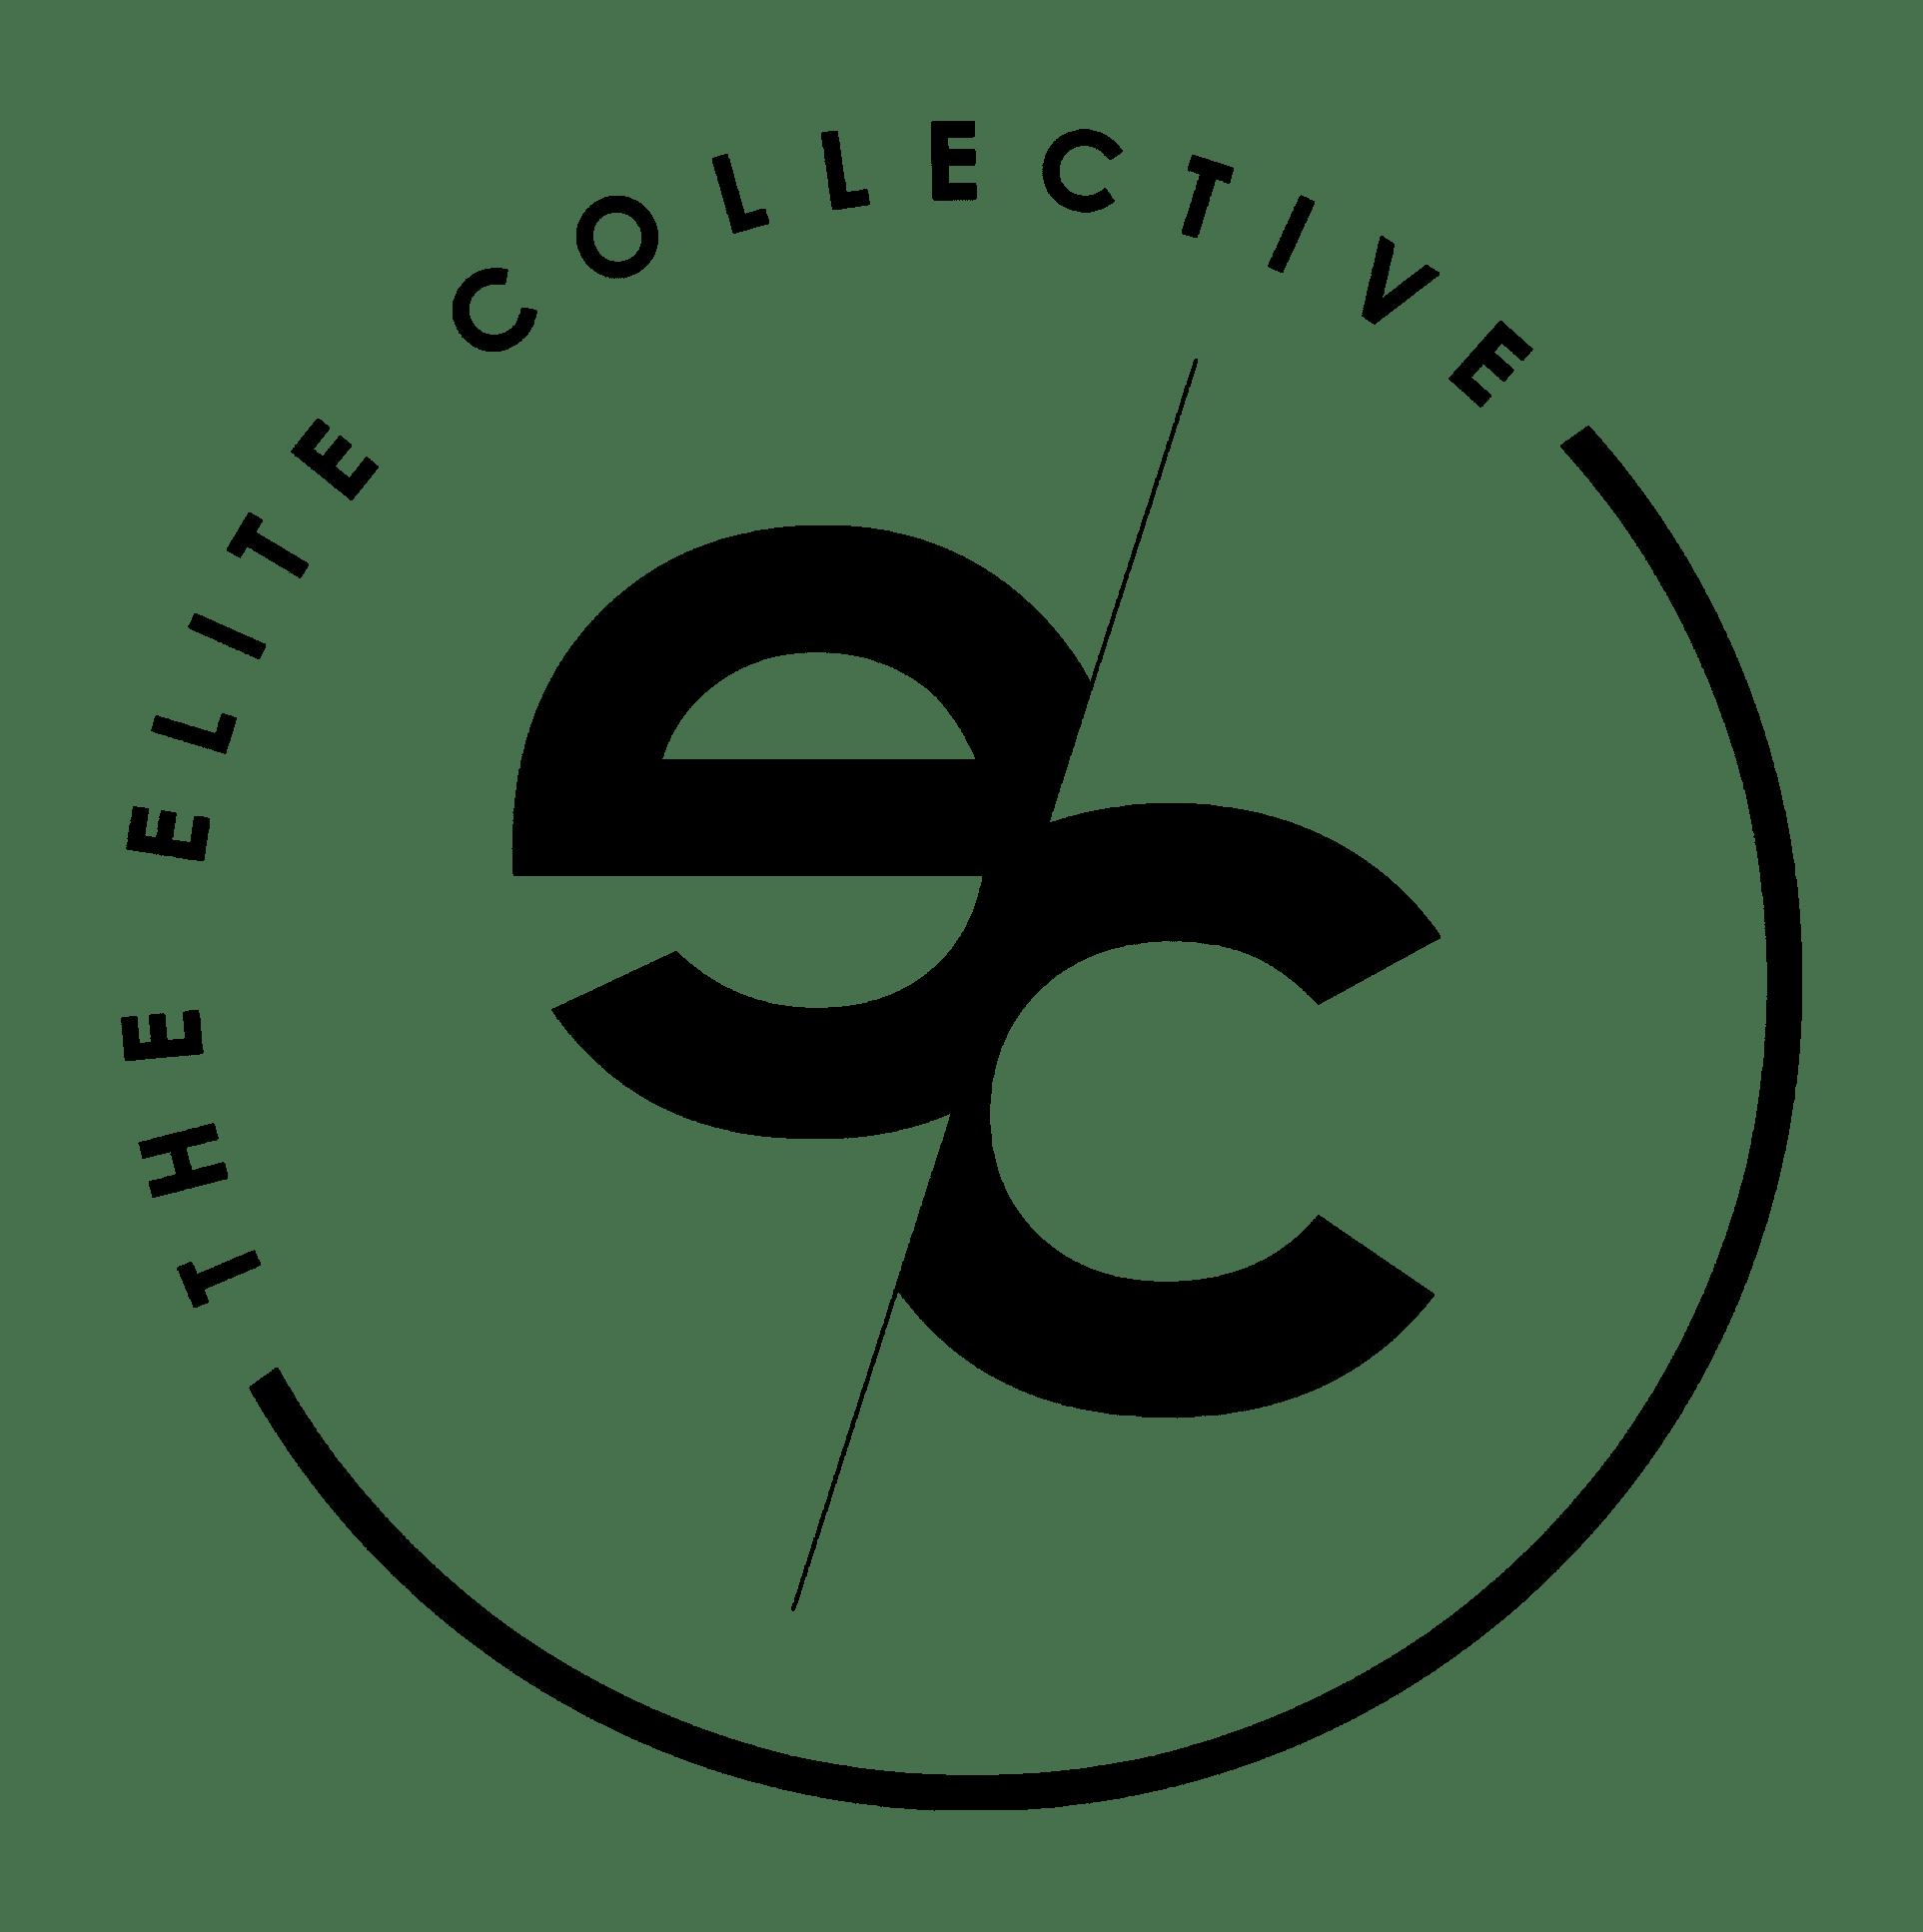 The Elite Collective